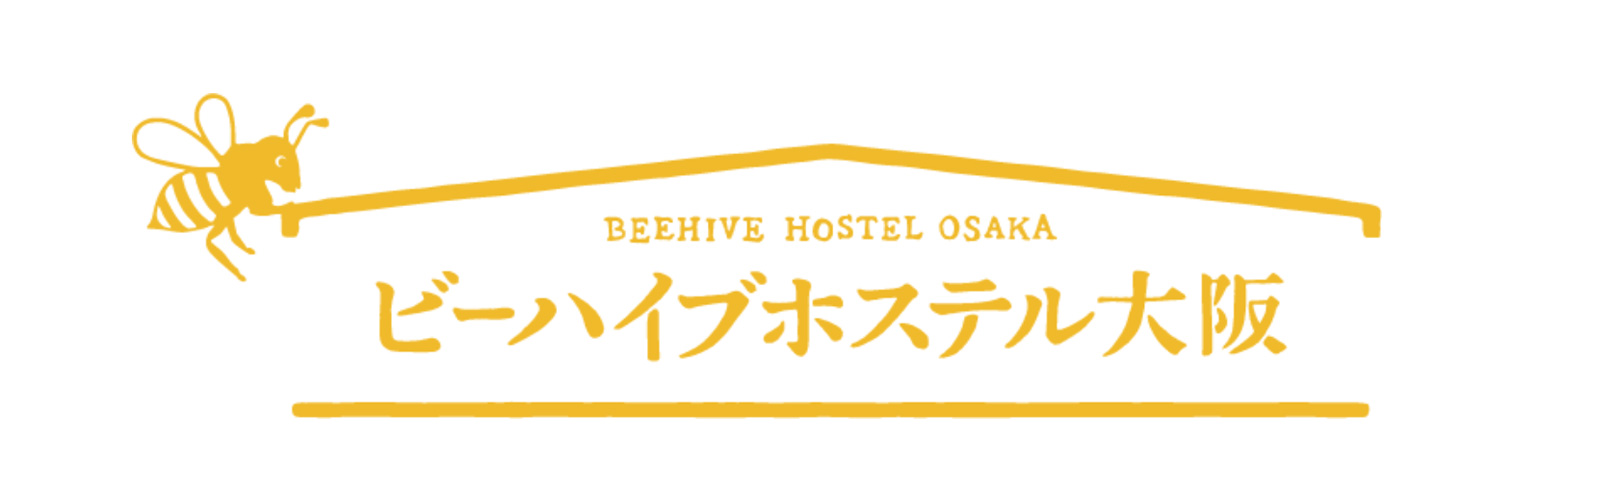 Beehive Hostel Osaka / 大阪蜂窩民宿(大阪・南船場)